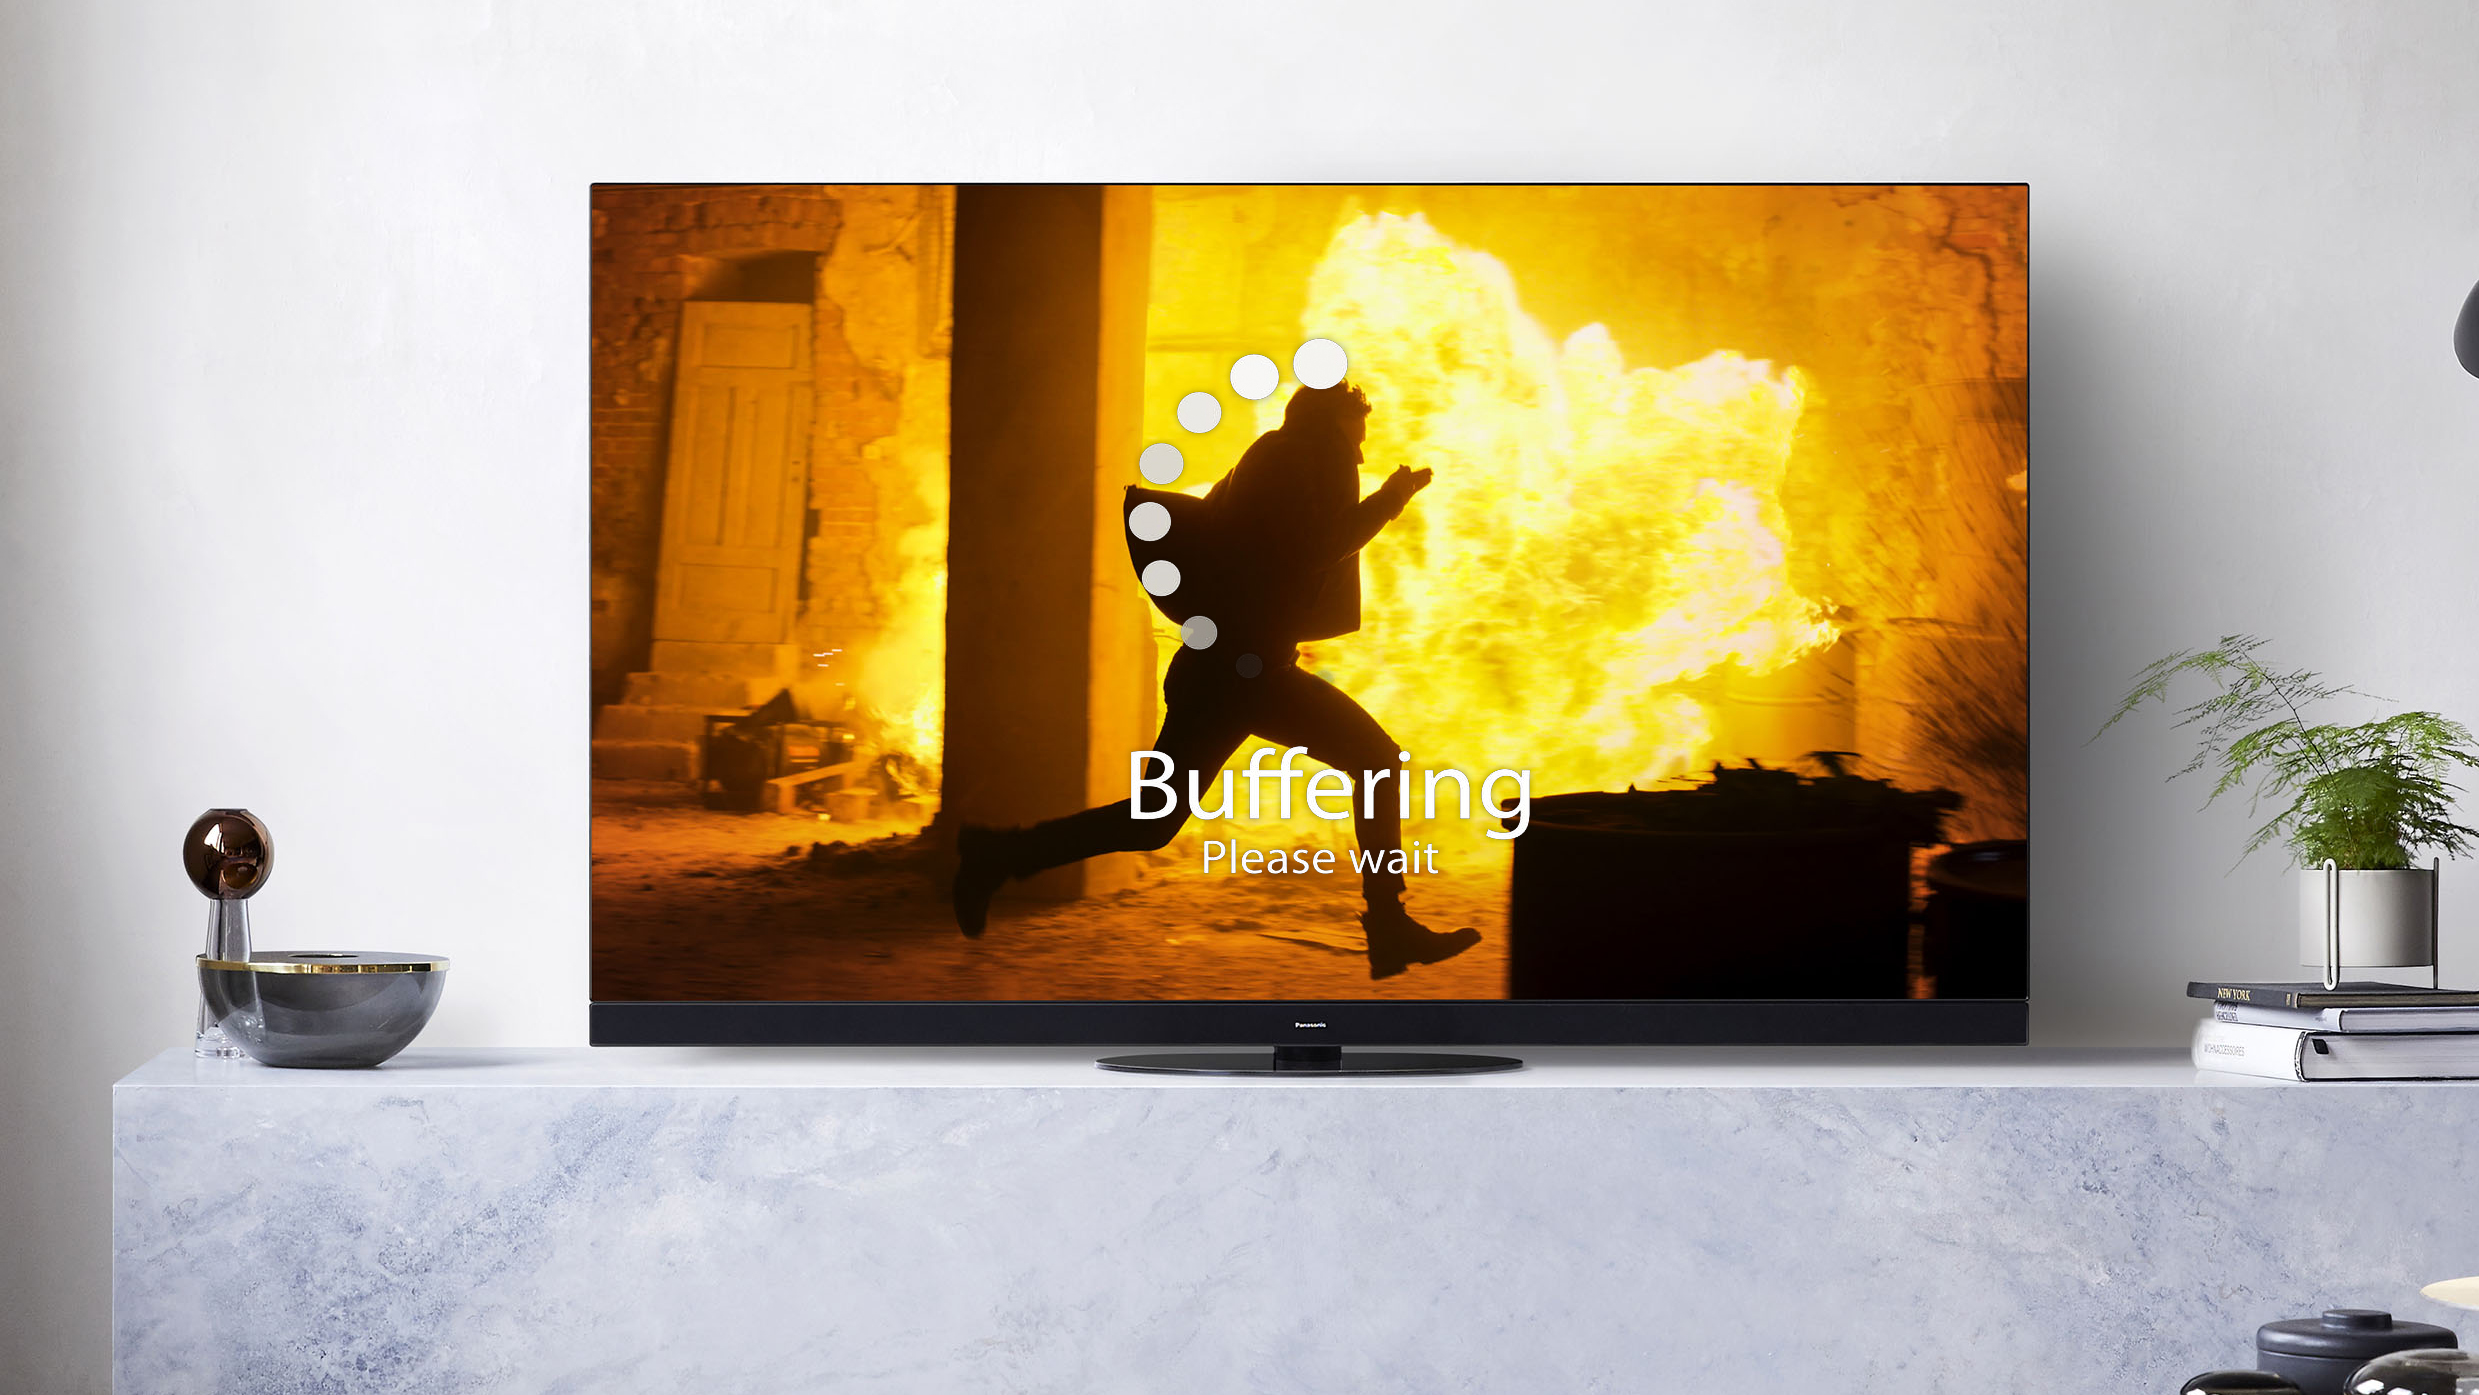 Smart TV gigabit ethernet